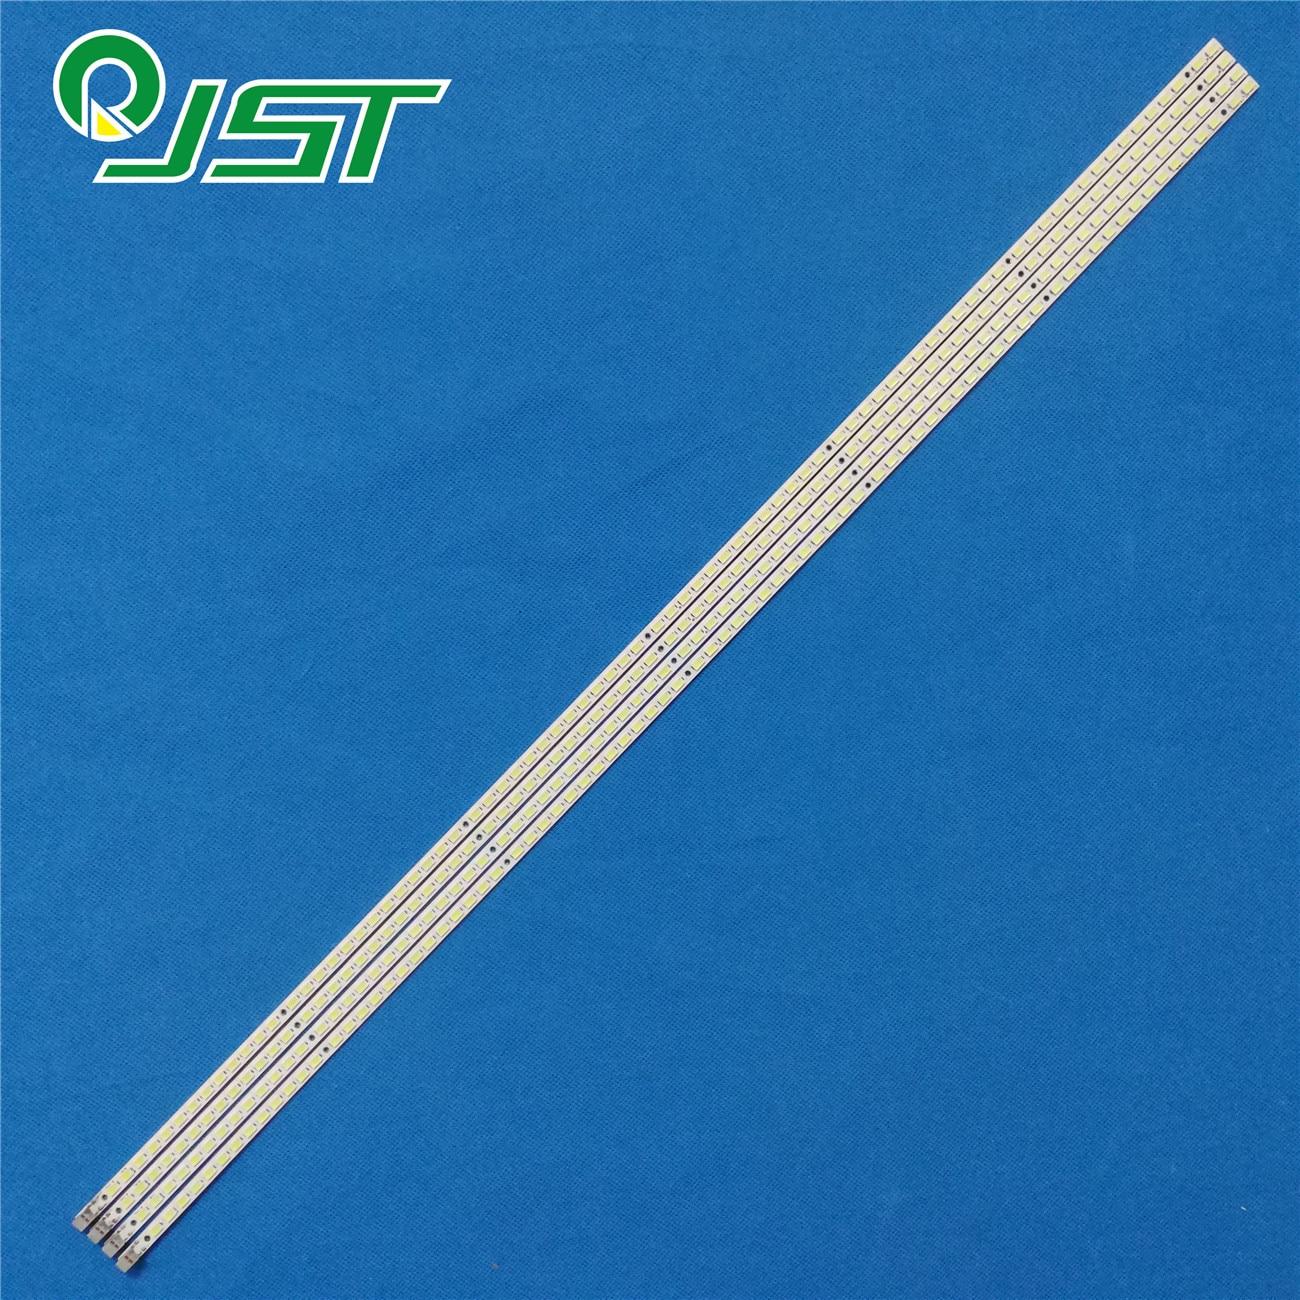 90% New 4pcs/Kit LED strips for SAMSUNG 55 TV LTF550HQ02 LTF550HJ03 LJ64 02386A LJ64 02391A SLED 2010SVS55 120/240HZ 80 OD V1.0